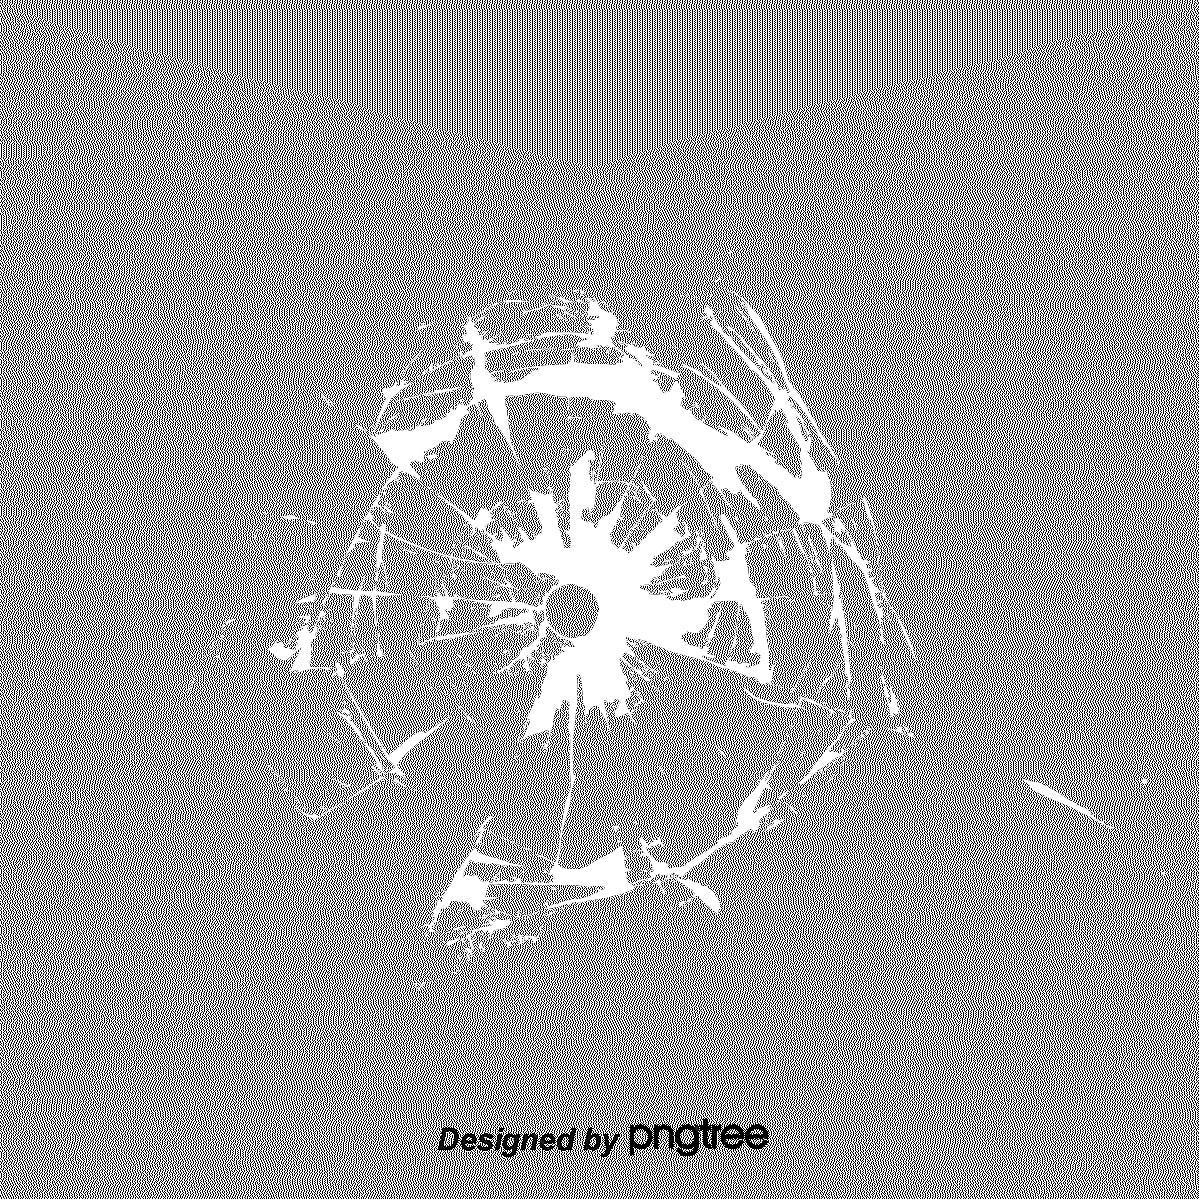 картинки осколок или разбитого стекла